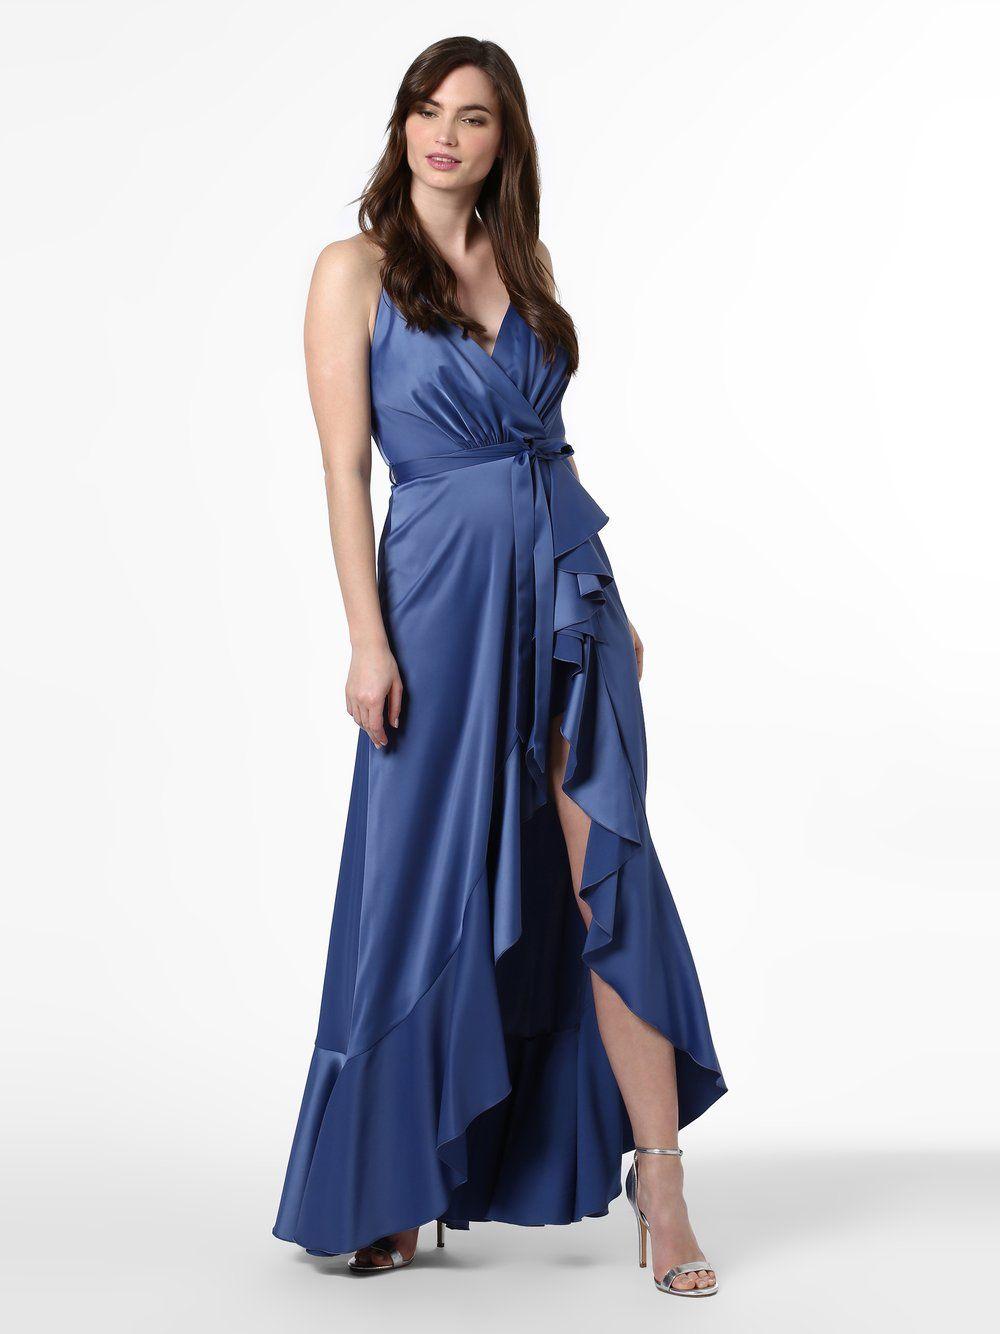 Marie Lund Abendkleid blau in 13  Abendkleid, Trendige kleider